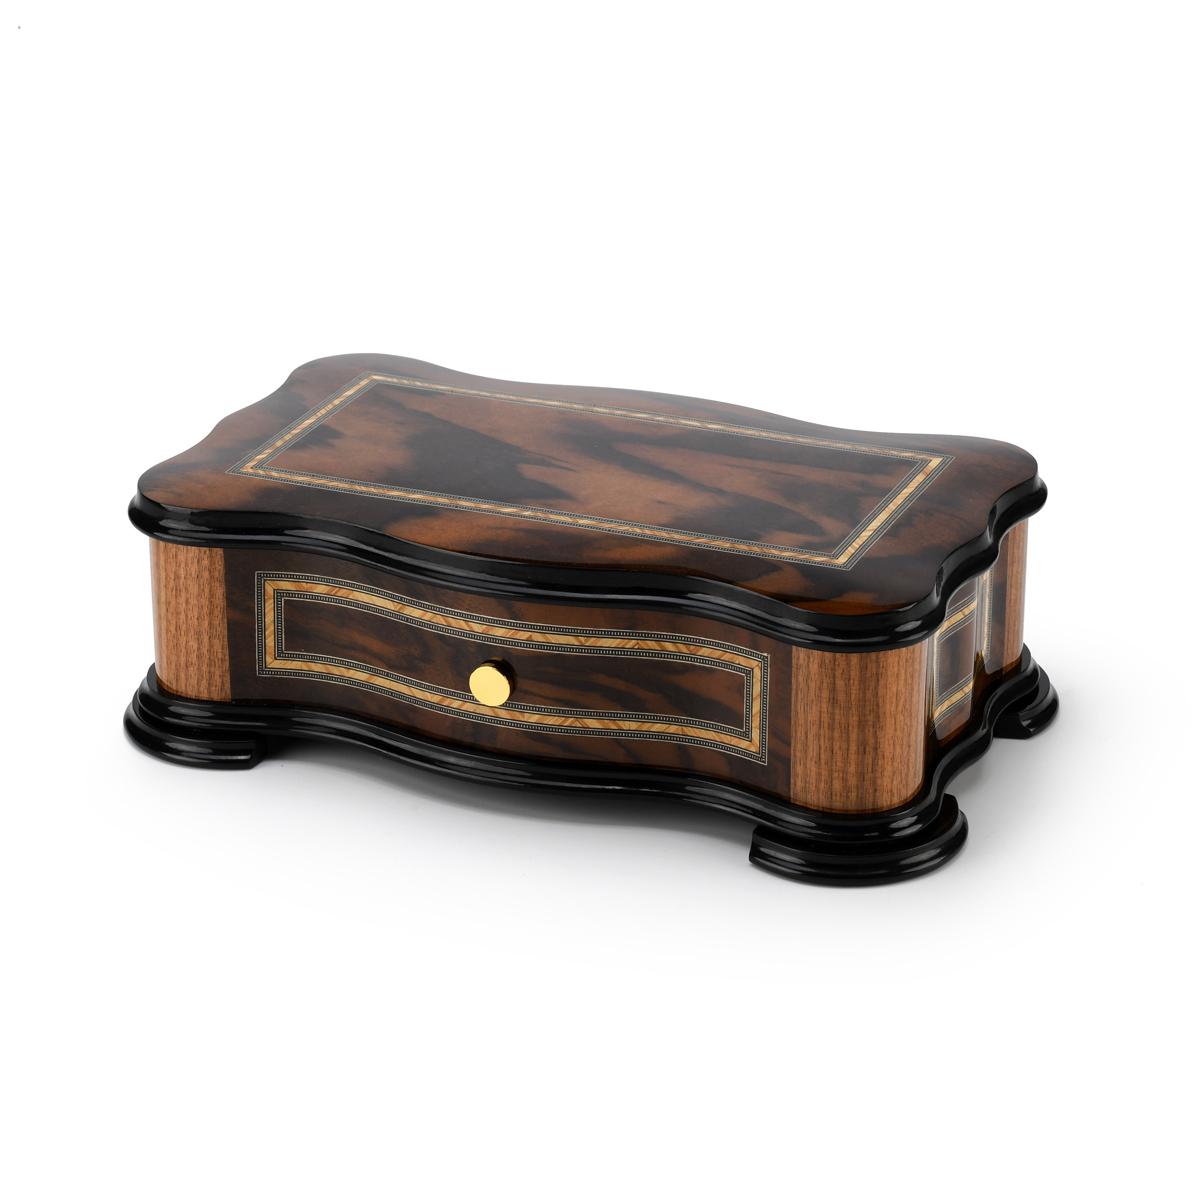 Handcrafted Italian Classic Style 72 Note Sankyo Grand Music Box